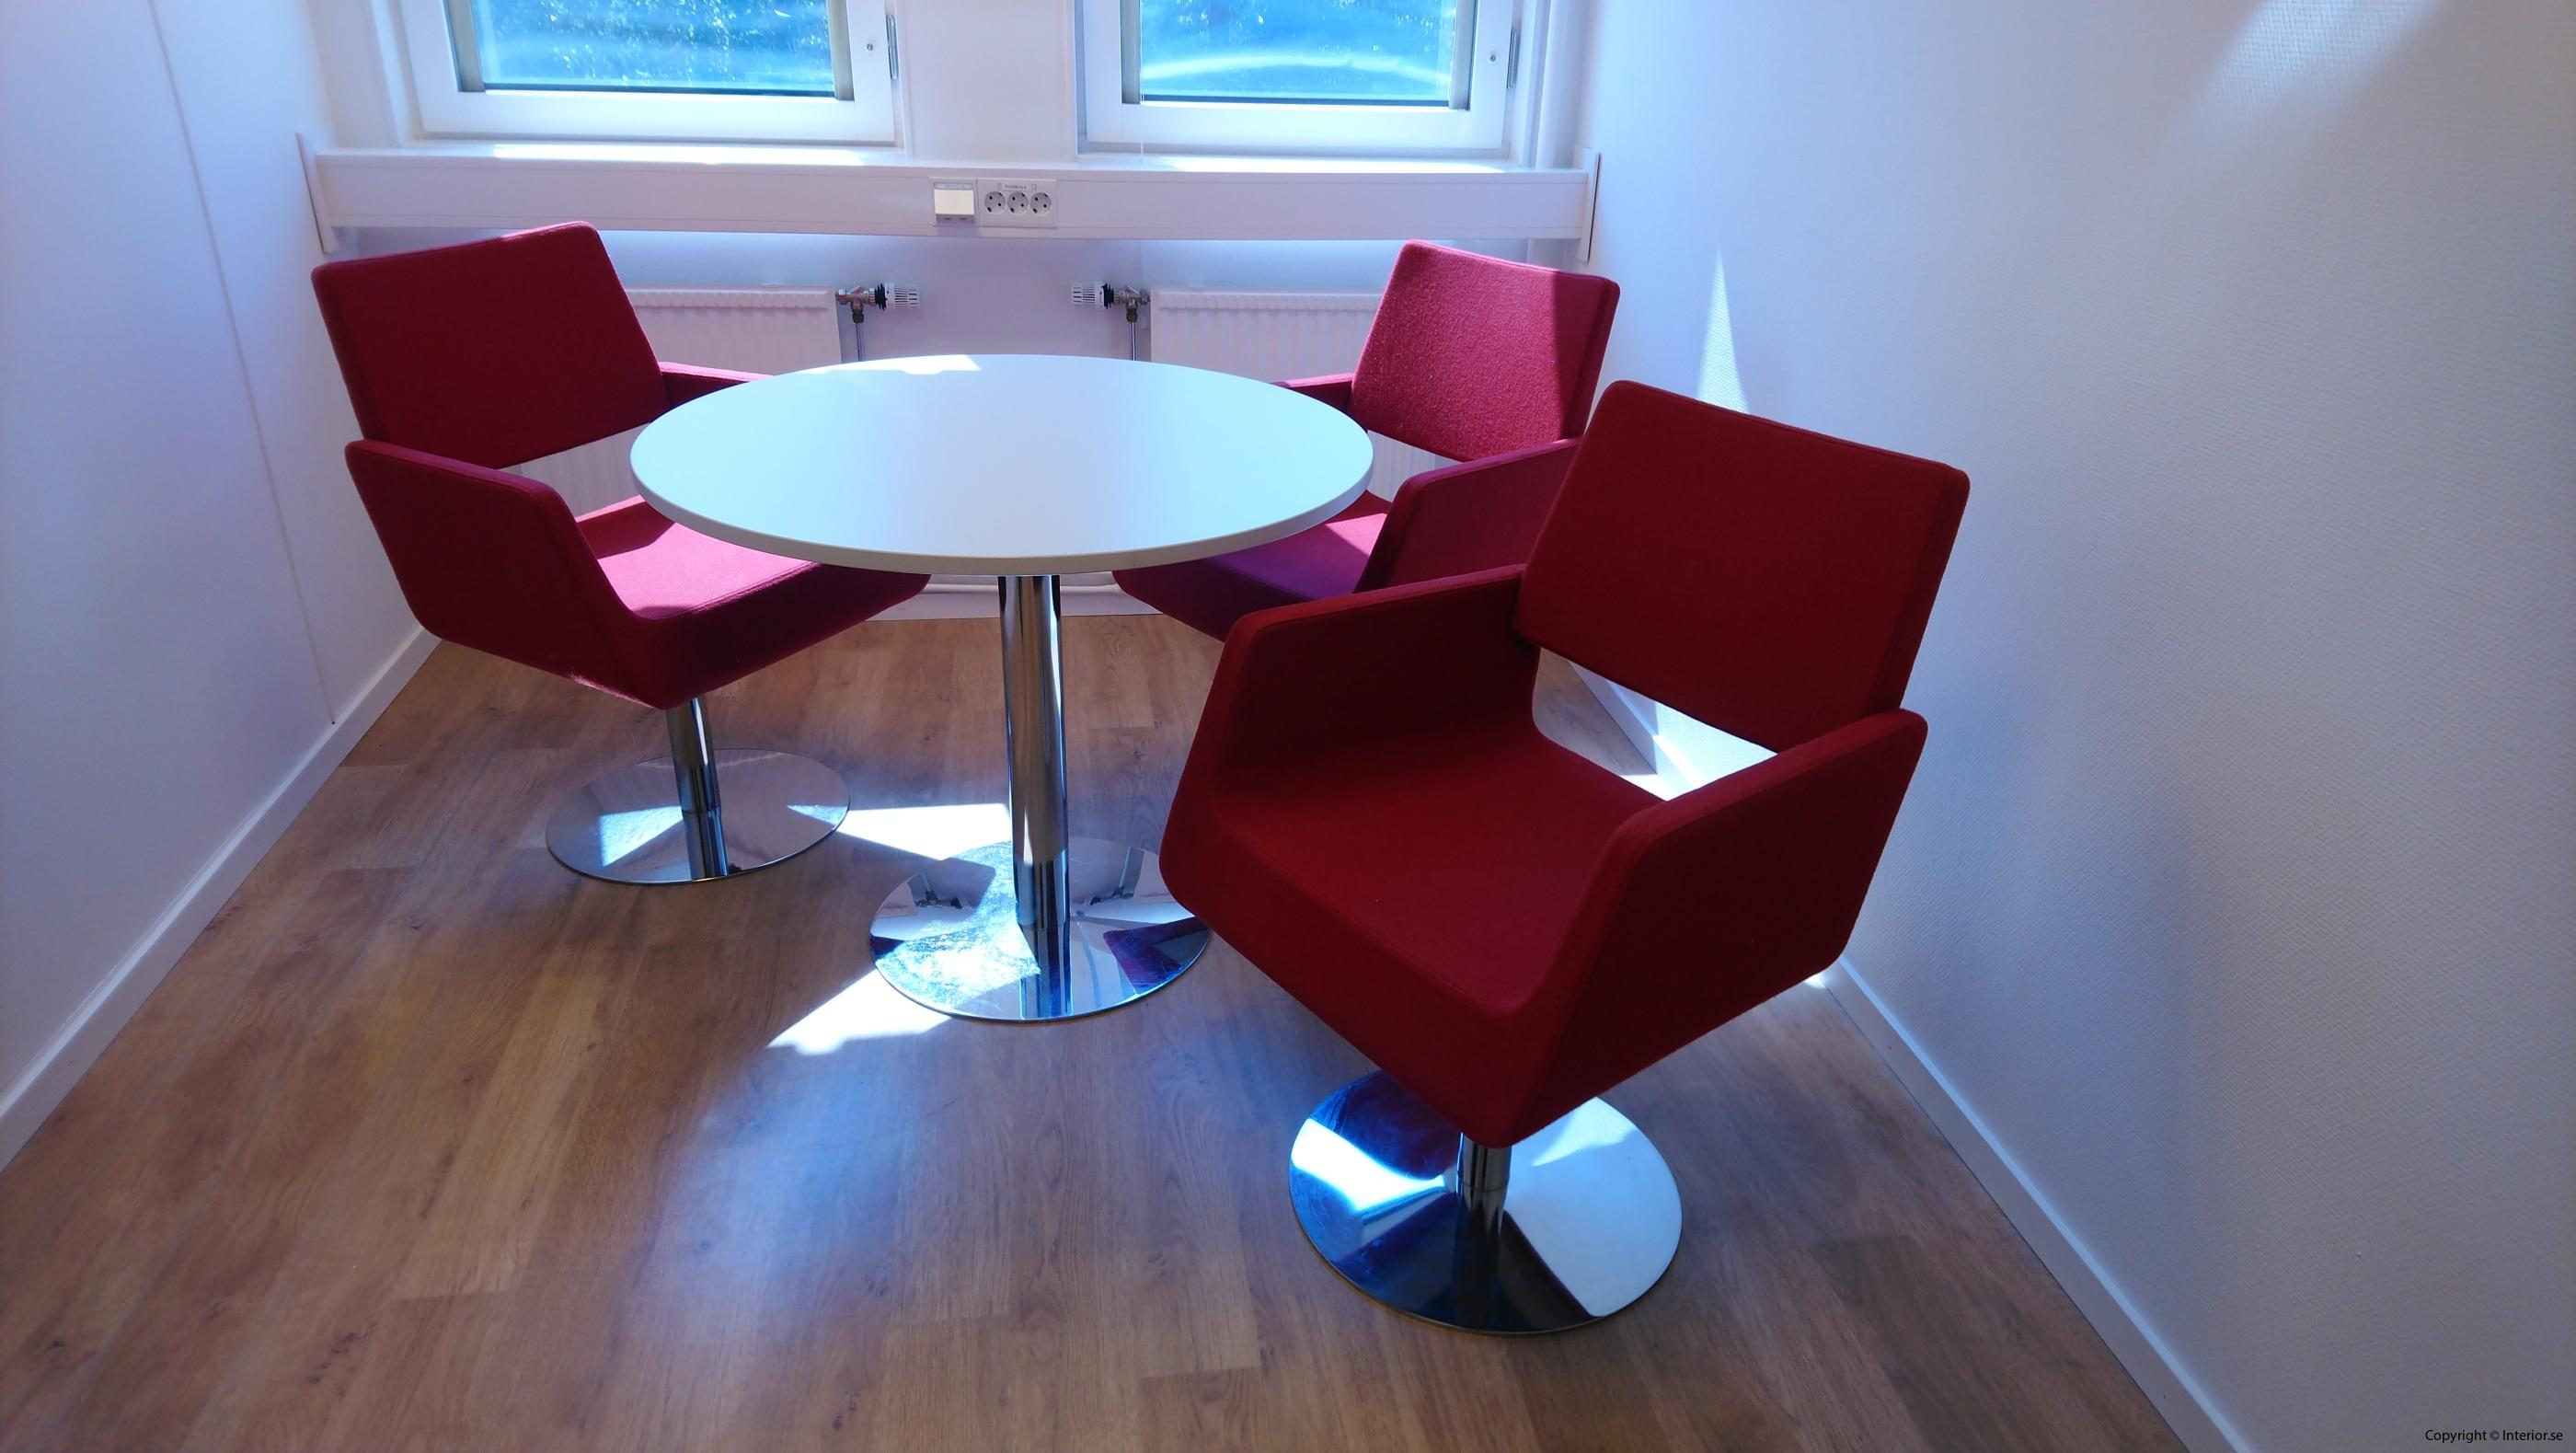 Loungegrupp, SA Möbler materia - 3 fåtöljer + bord - Loungemöbler begagnade designmöbler (5)